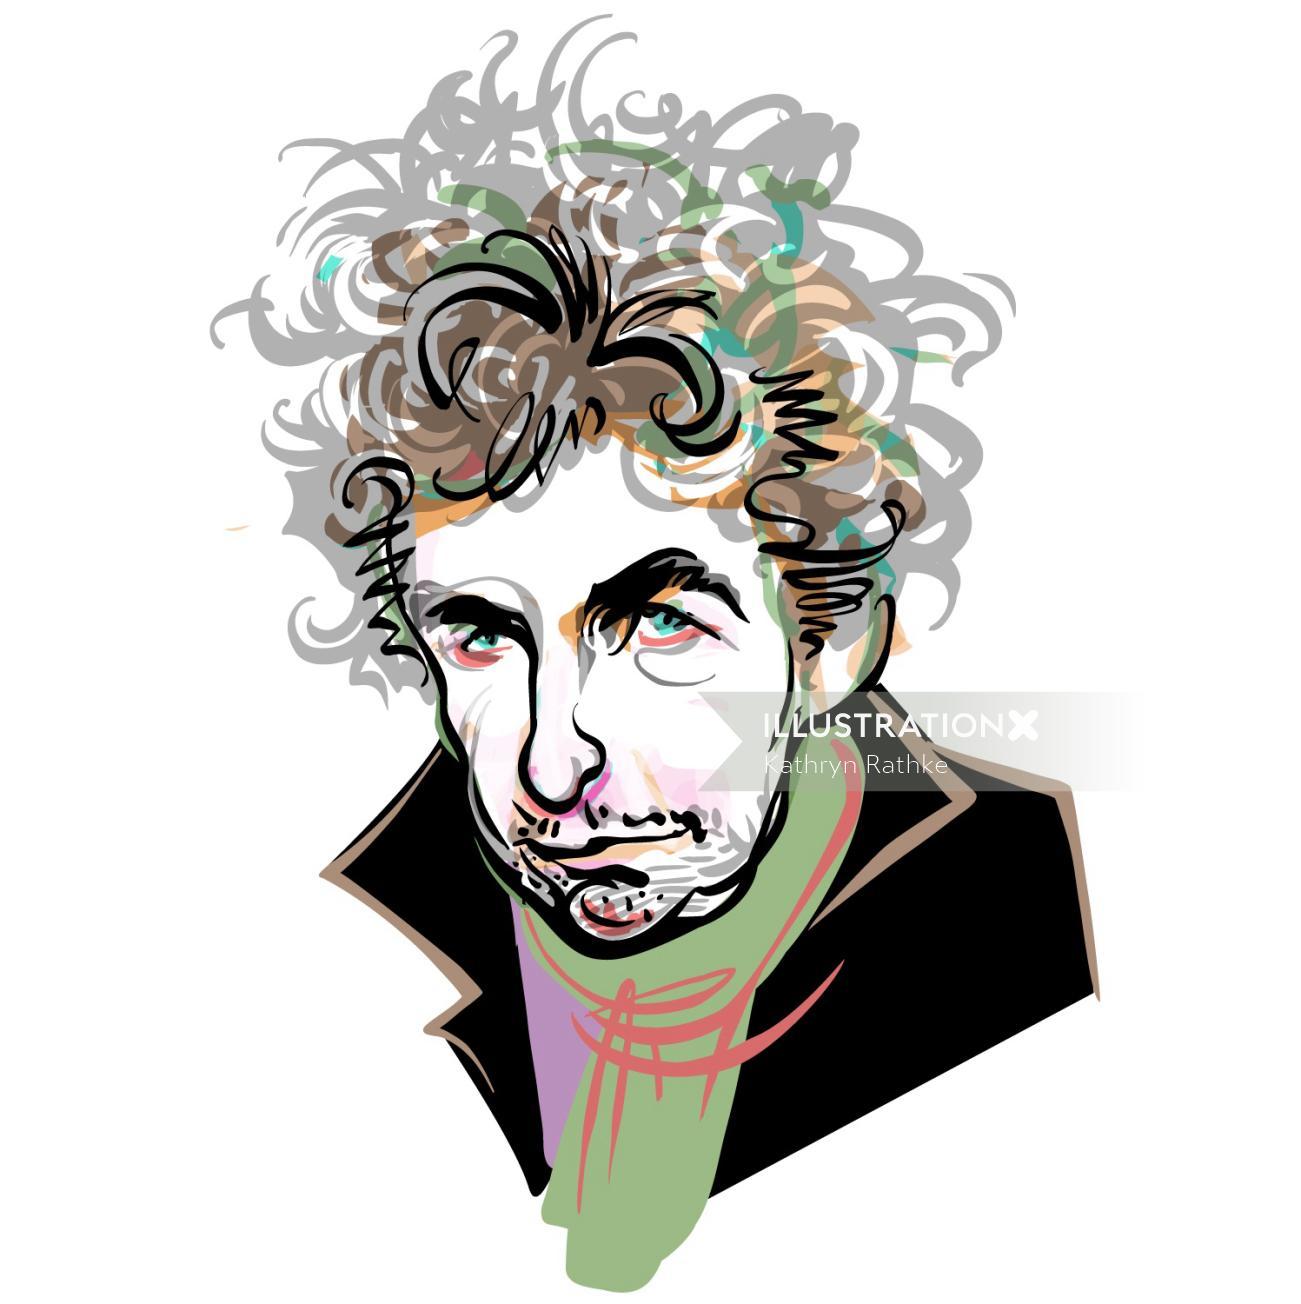 Intelligent Life Bob Dylan Digital portrait